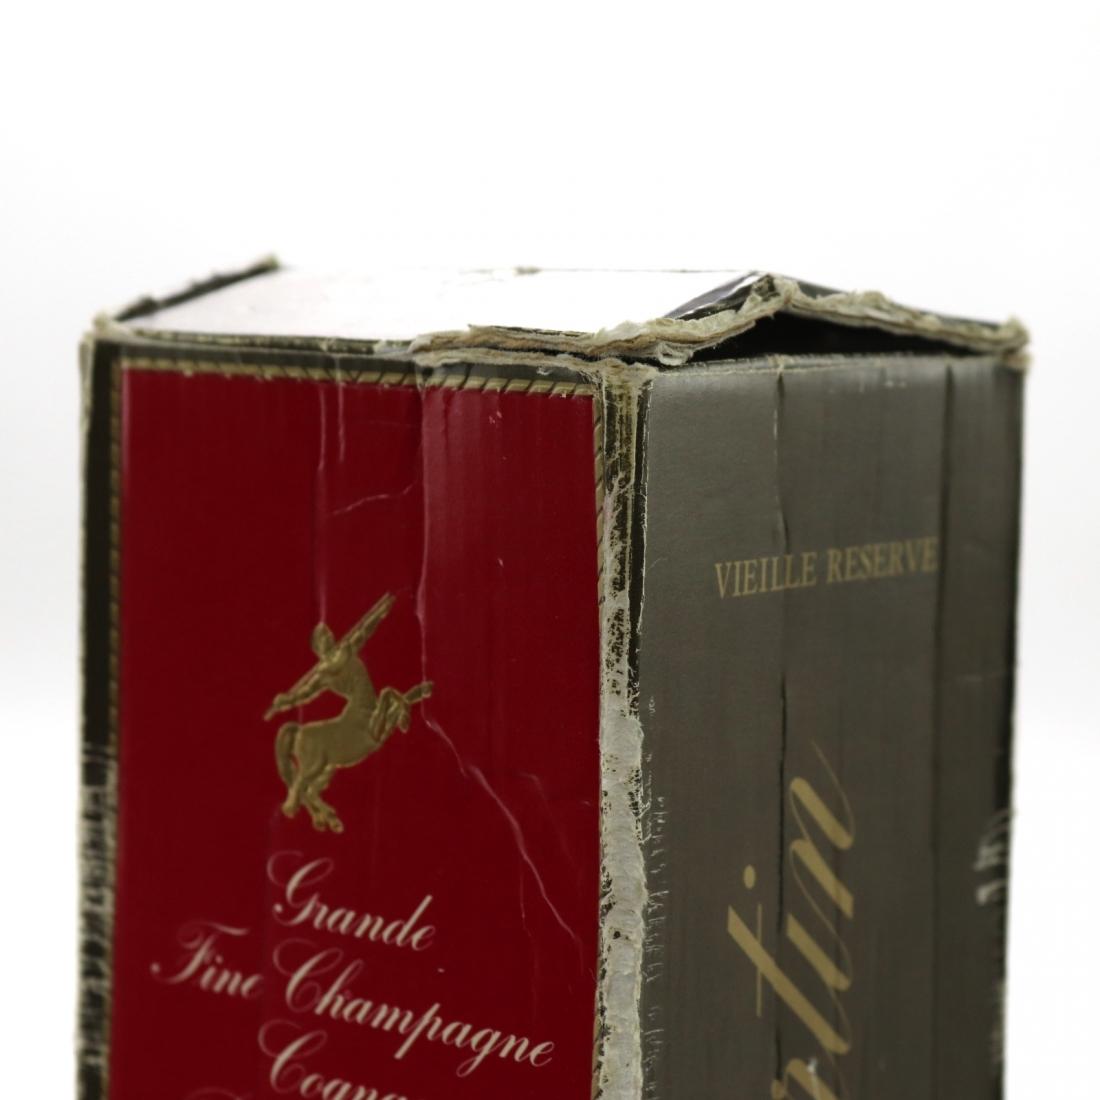 Remy Martin Age Inconnu Grande Fine Champagne Cognac 1970s / German Import